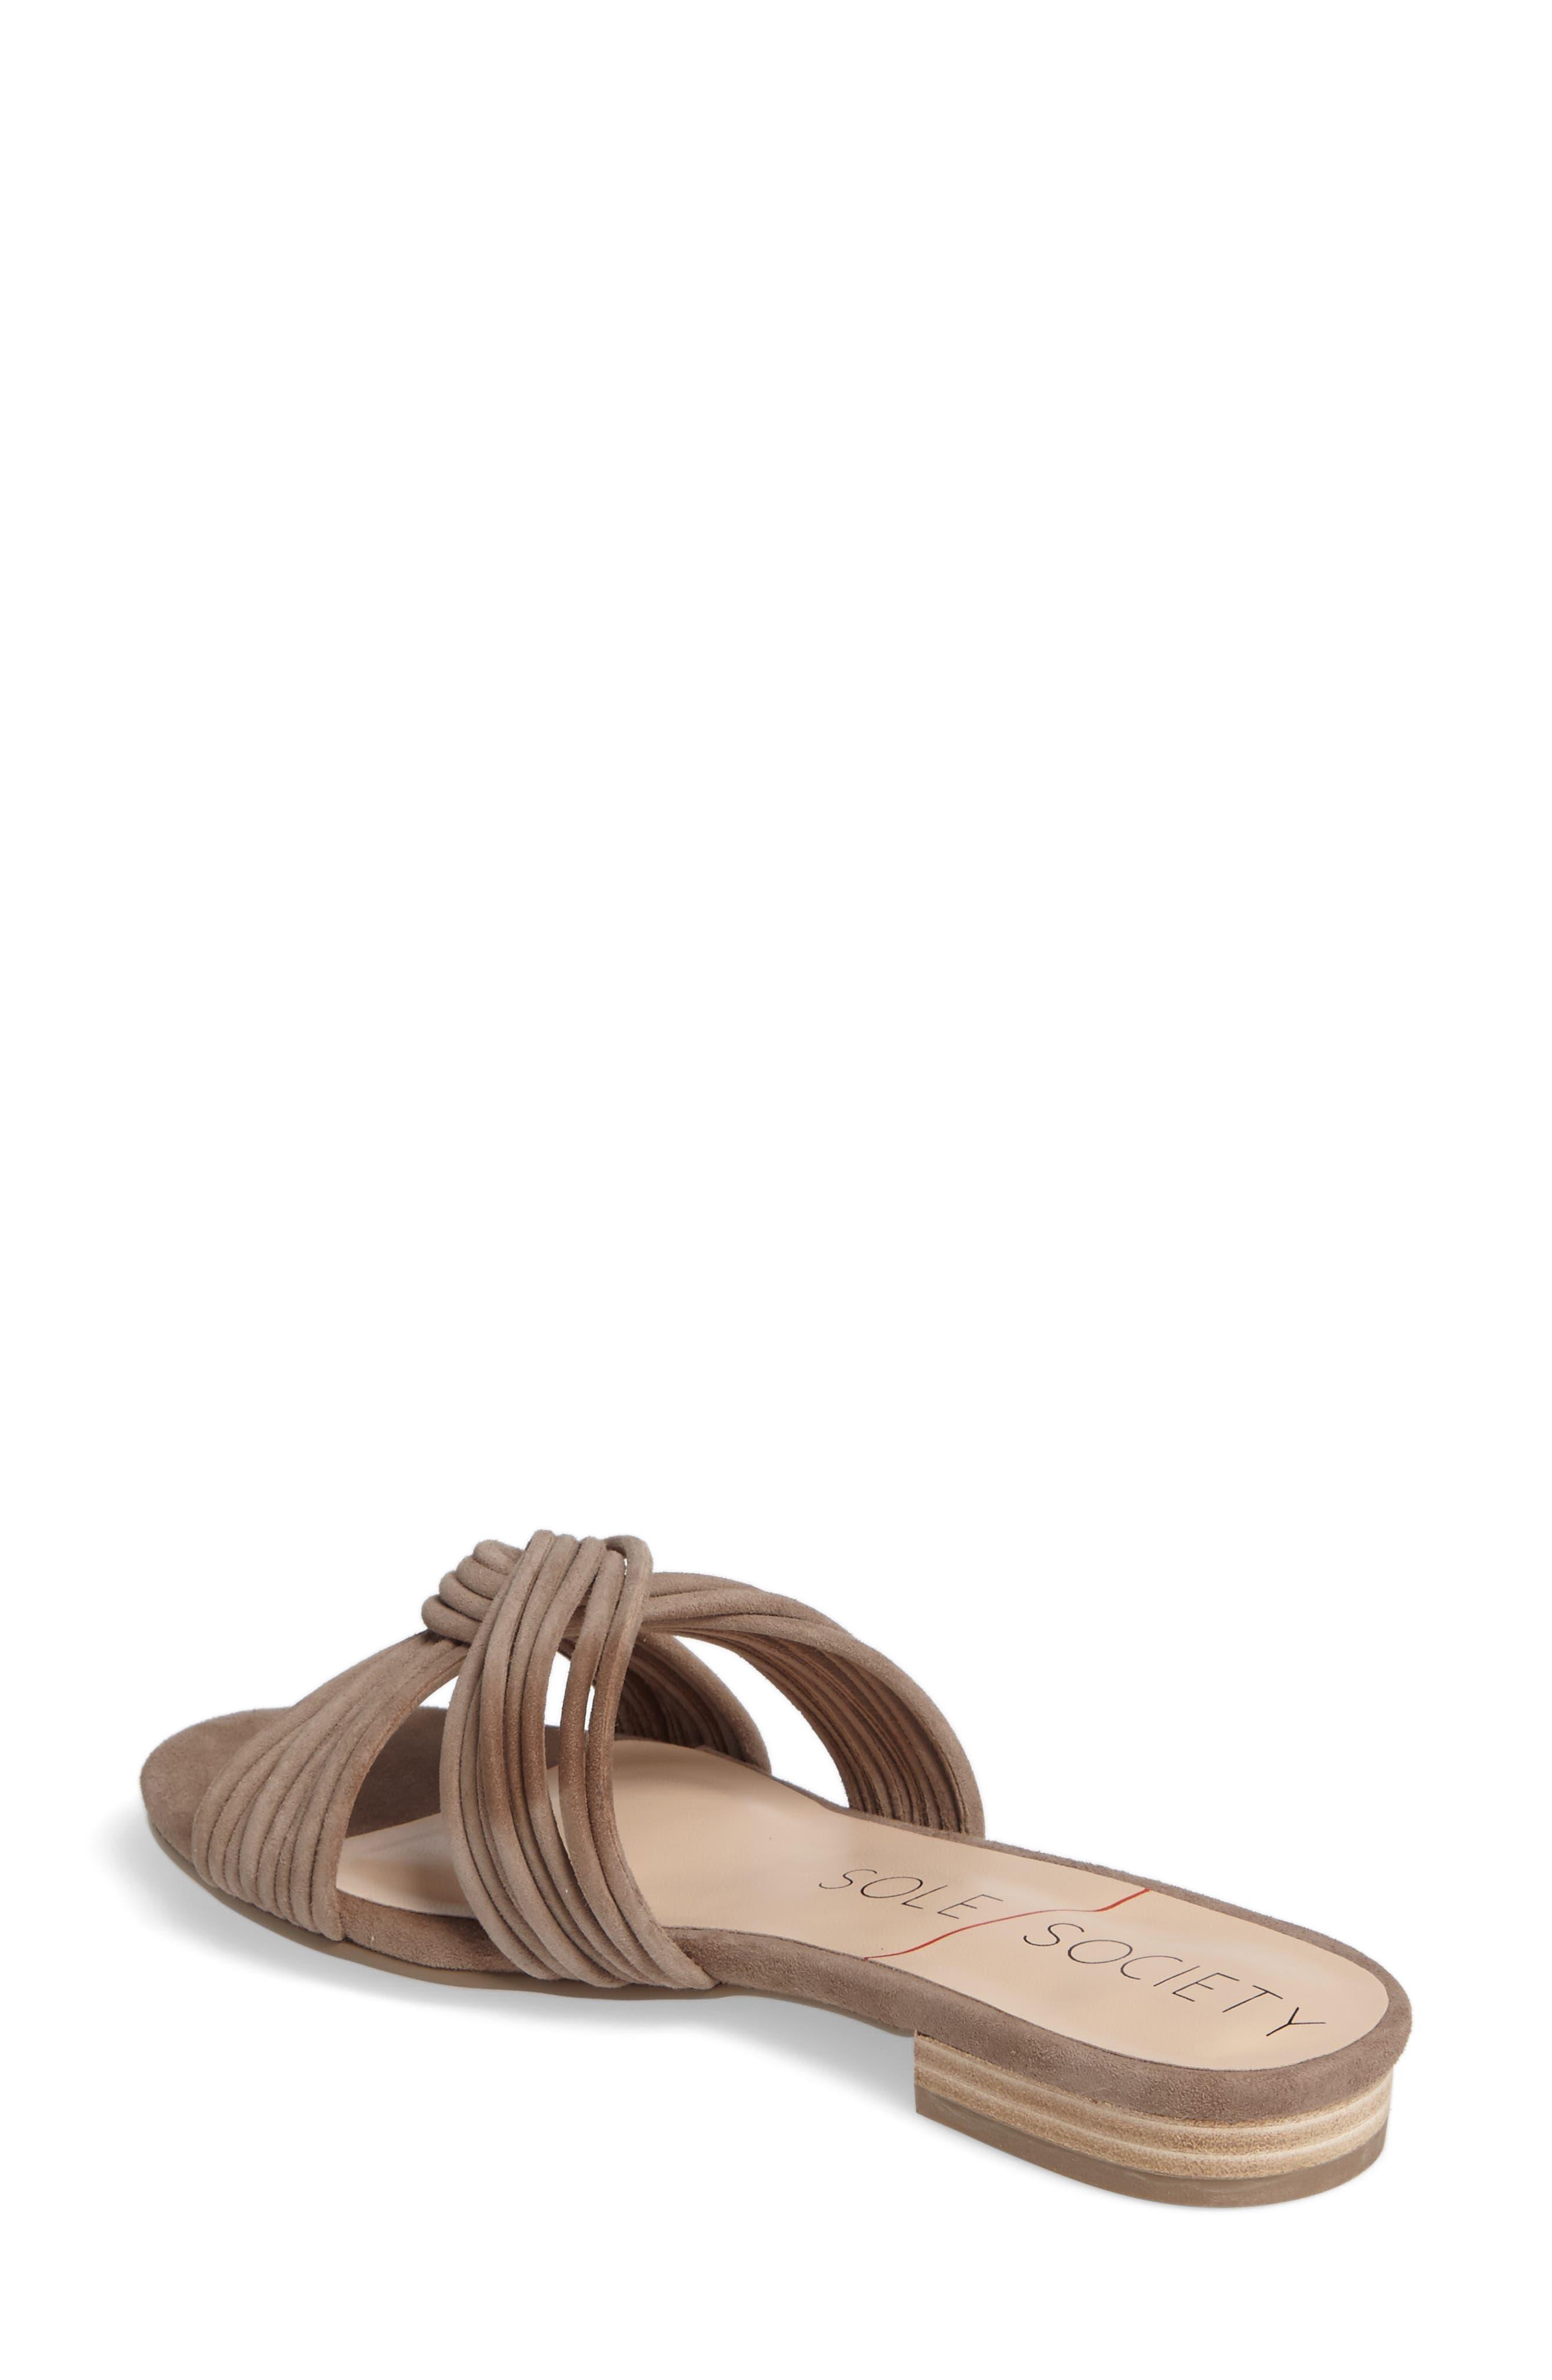 SOLE SOCIETY, Dahlia Flat Sandal, Alternate thumbnail 2, color, 240